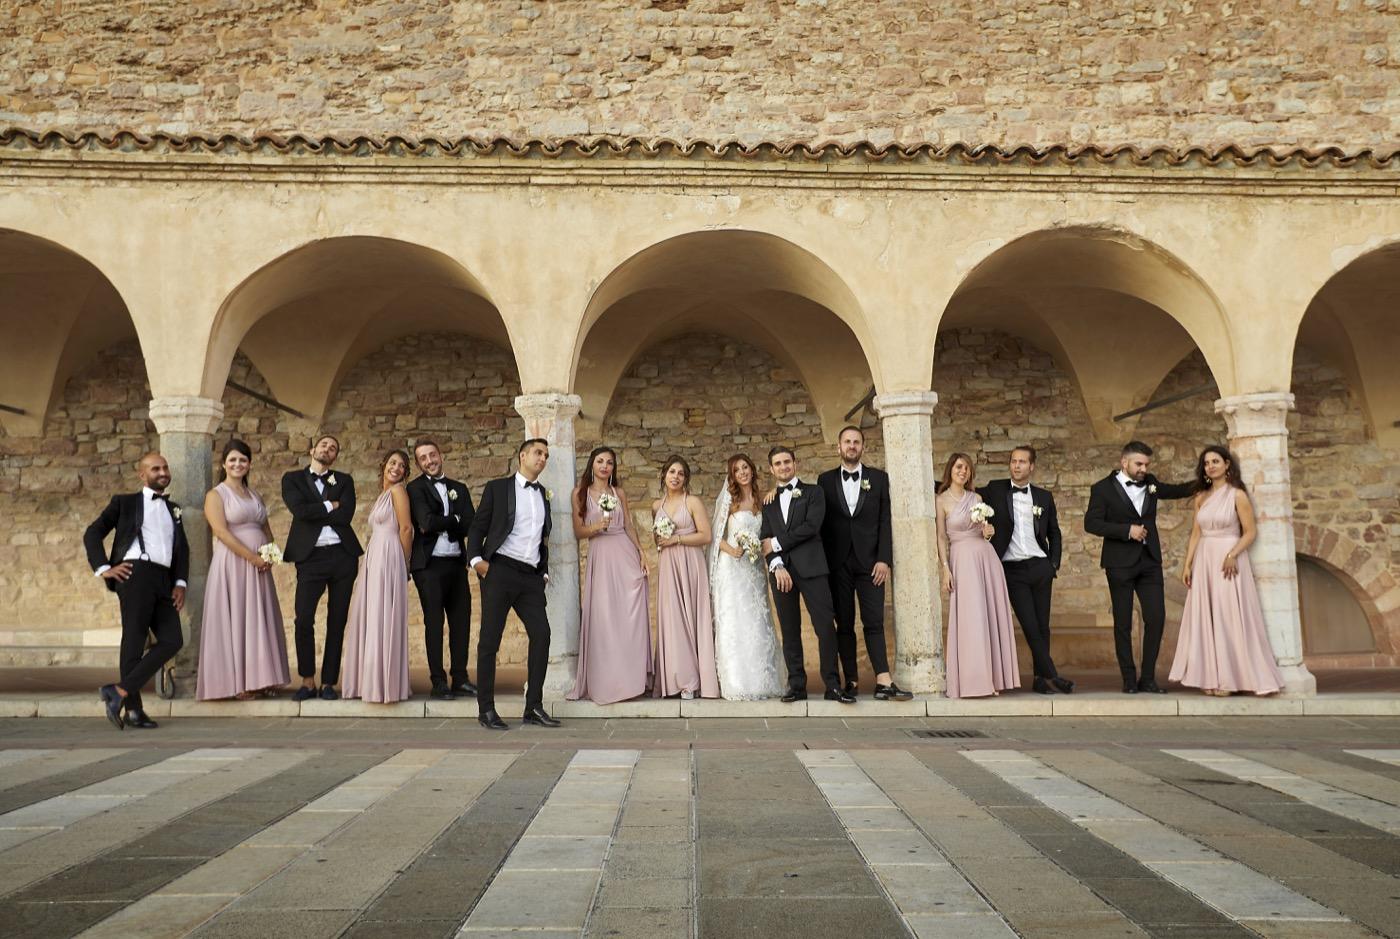 Claudio-Coppola-wedding-photographer-abbazia-7-frati-piegaro-82